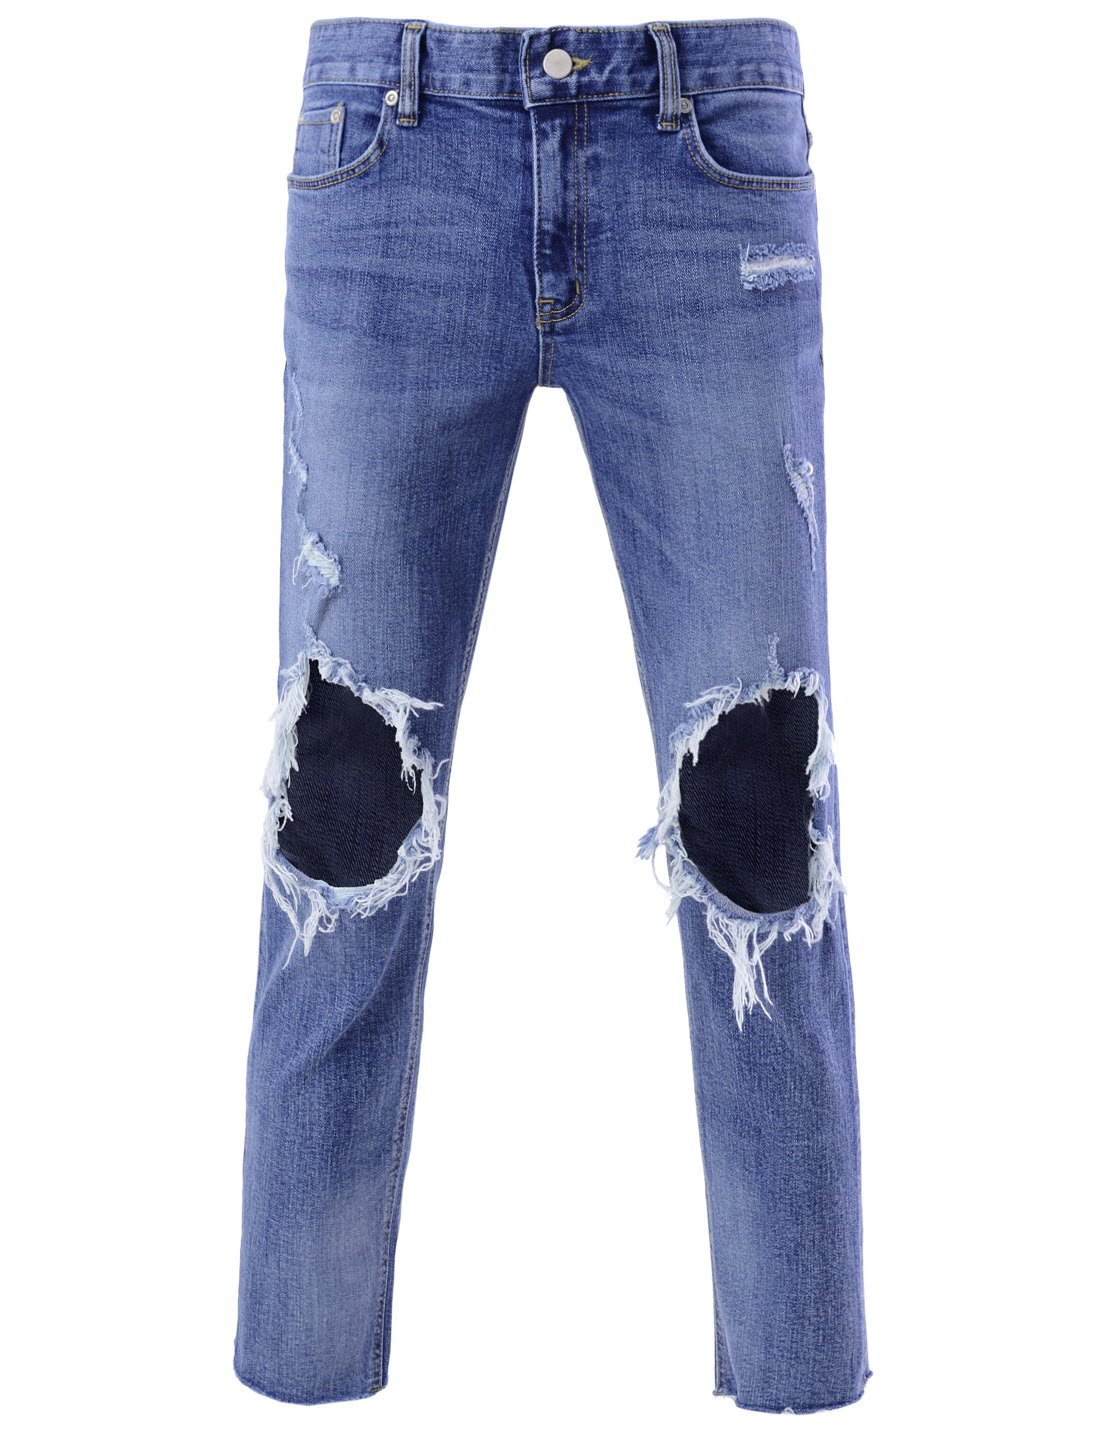 DETYLISH SJ5016 Men Straight Fit Denim Destroyed Damage Cutting Unhemmed Jeans Blue 27W/26L(Tag Size S)